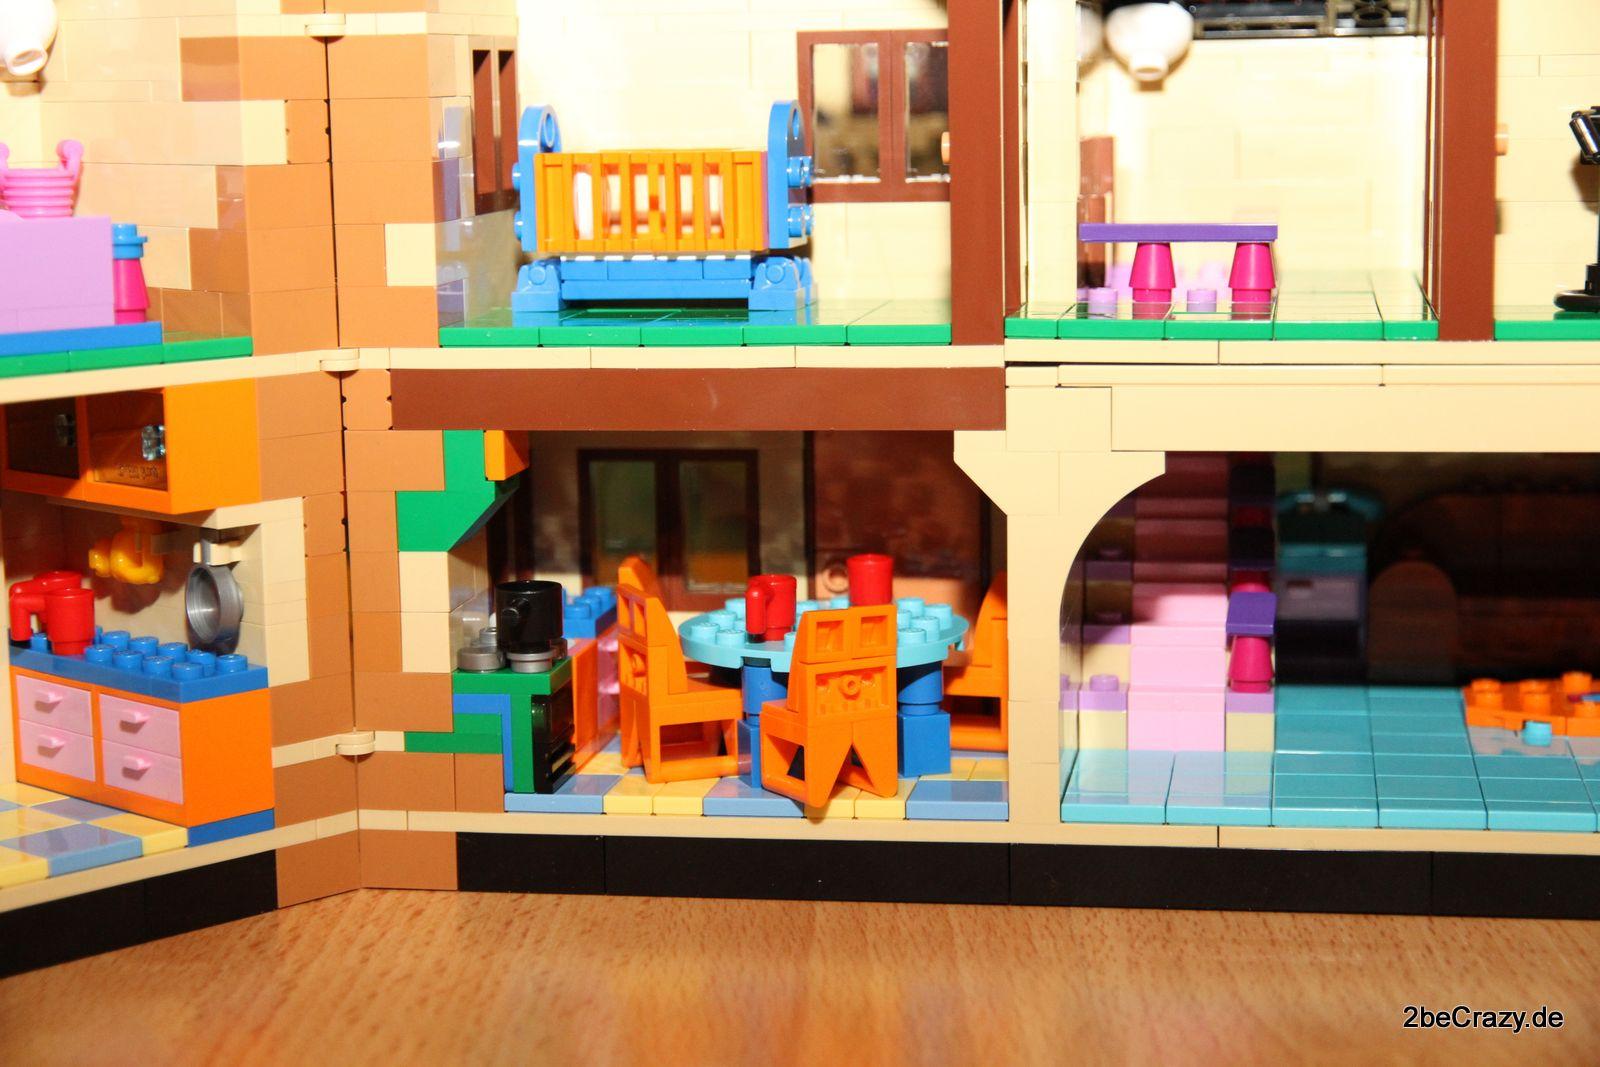 Simpsons haus lego 53 2becrazy for Lego modernes haus